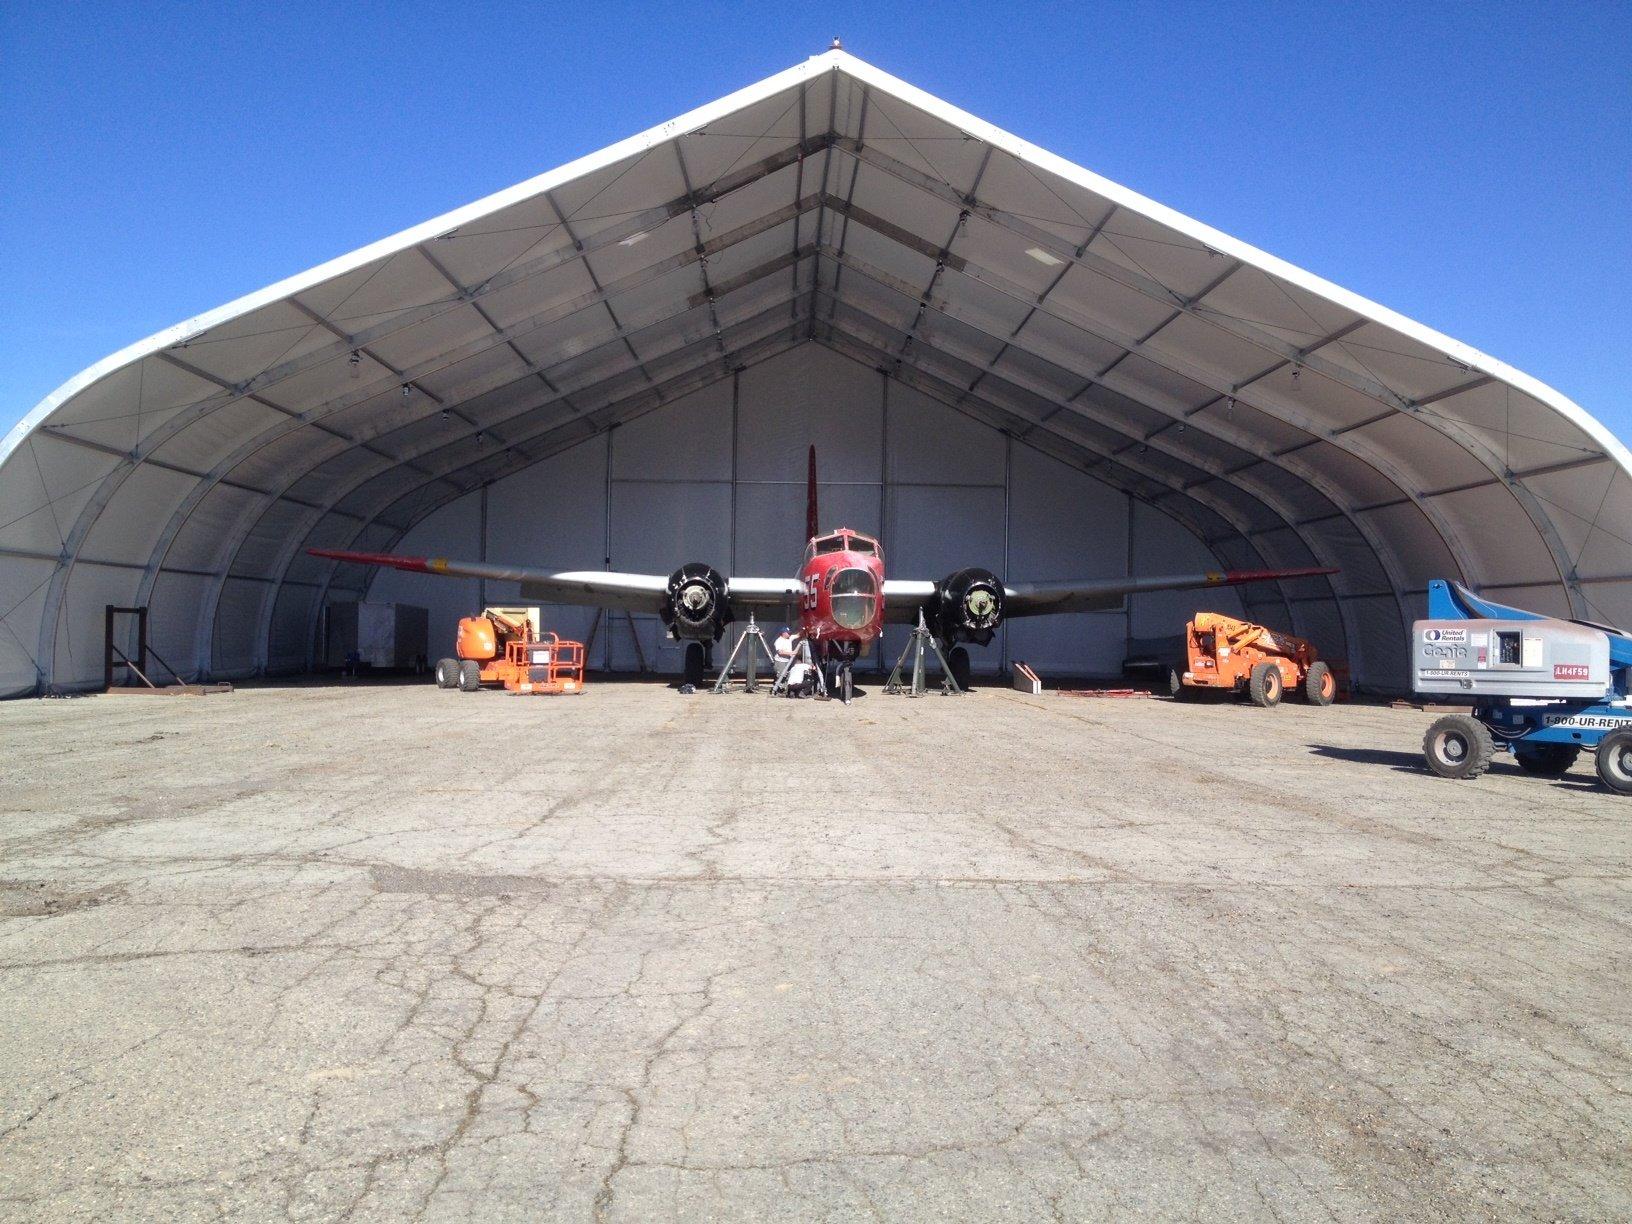 Aircraft hangar trendy airplane hangar with aircraft for Aircraft hanger designs